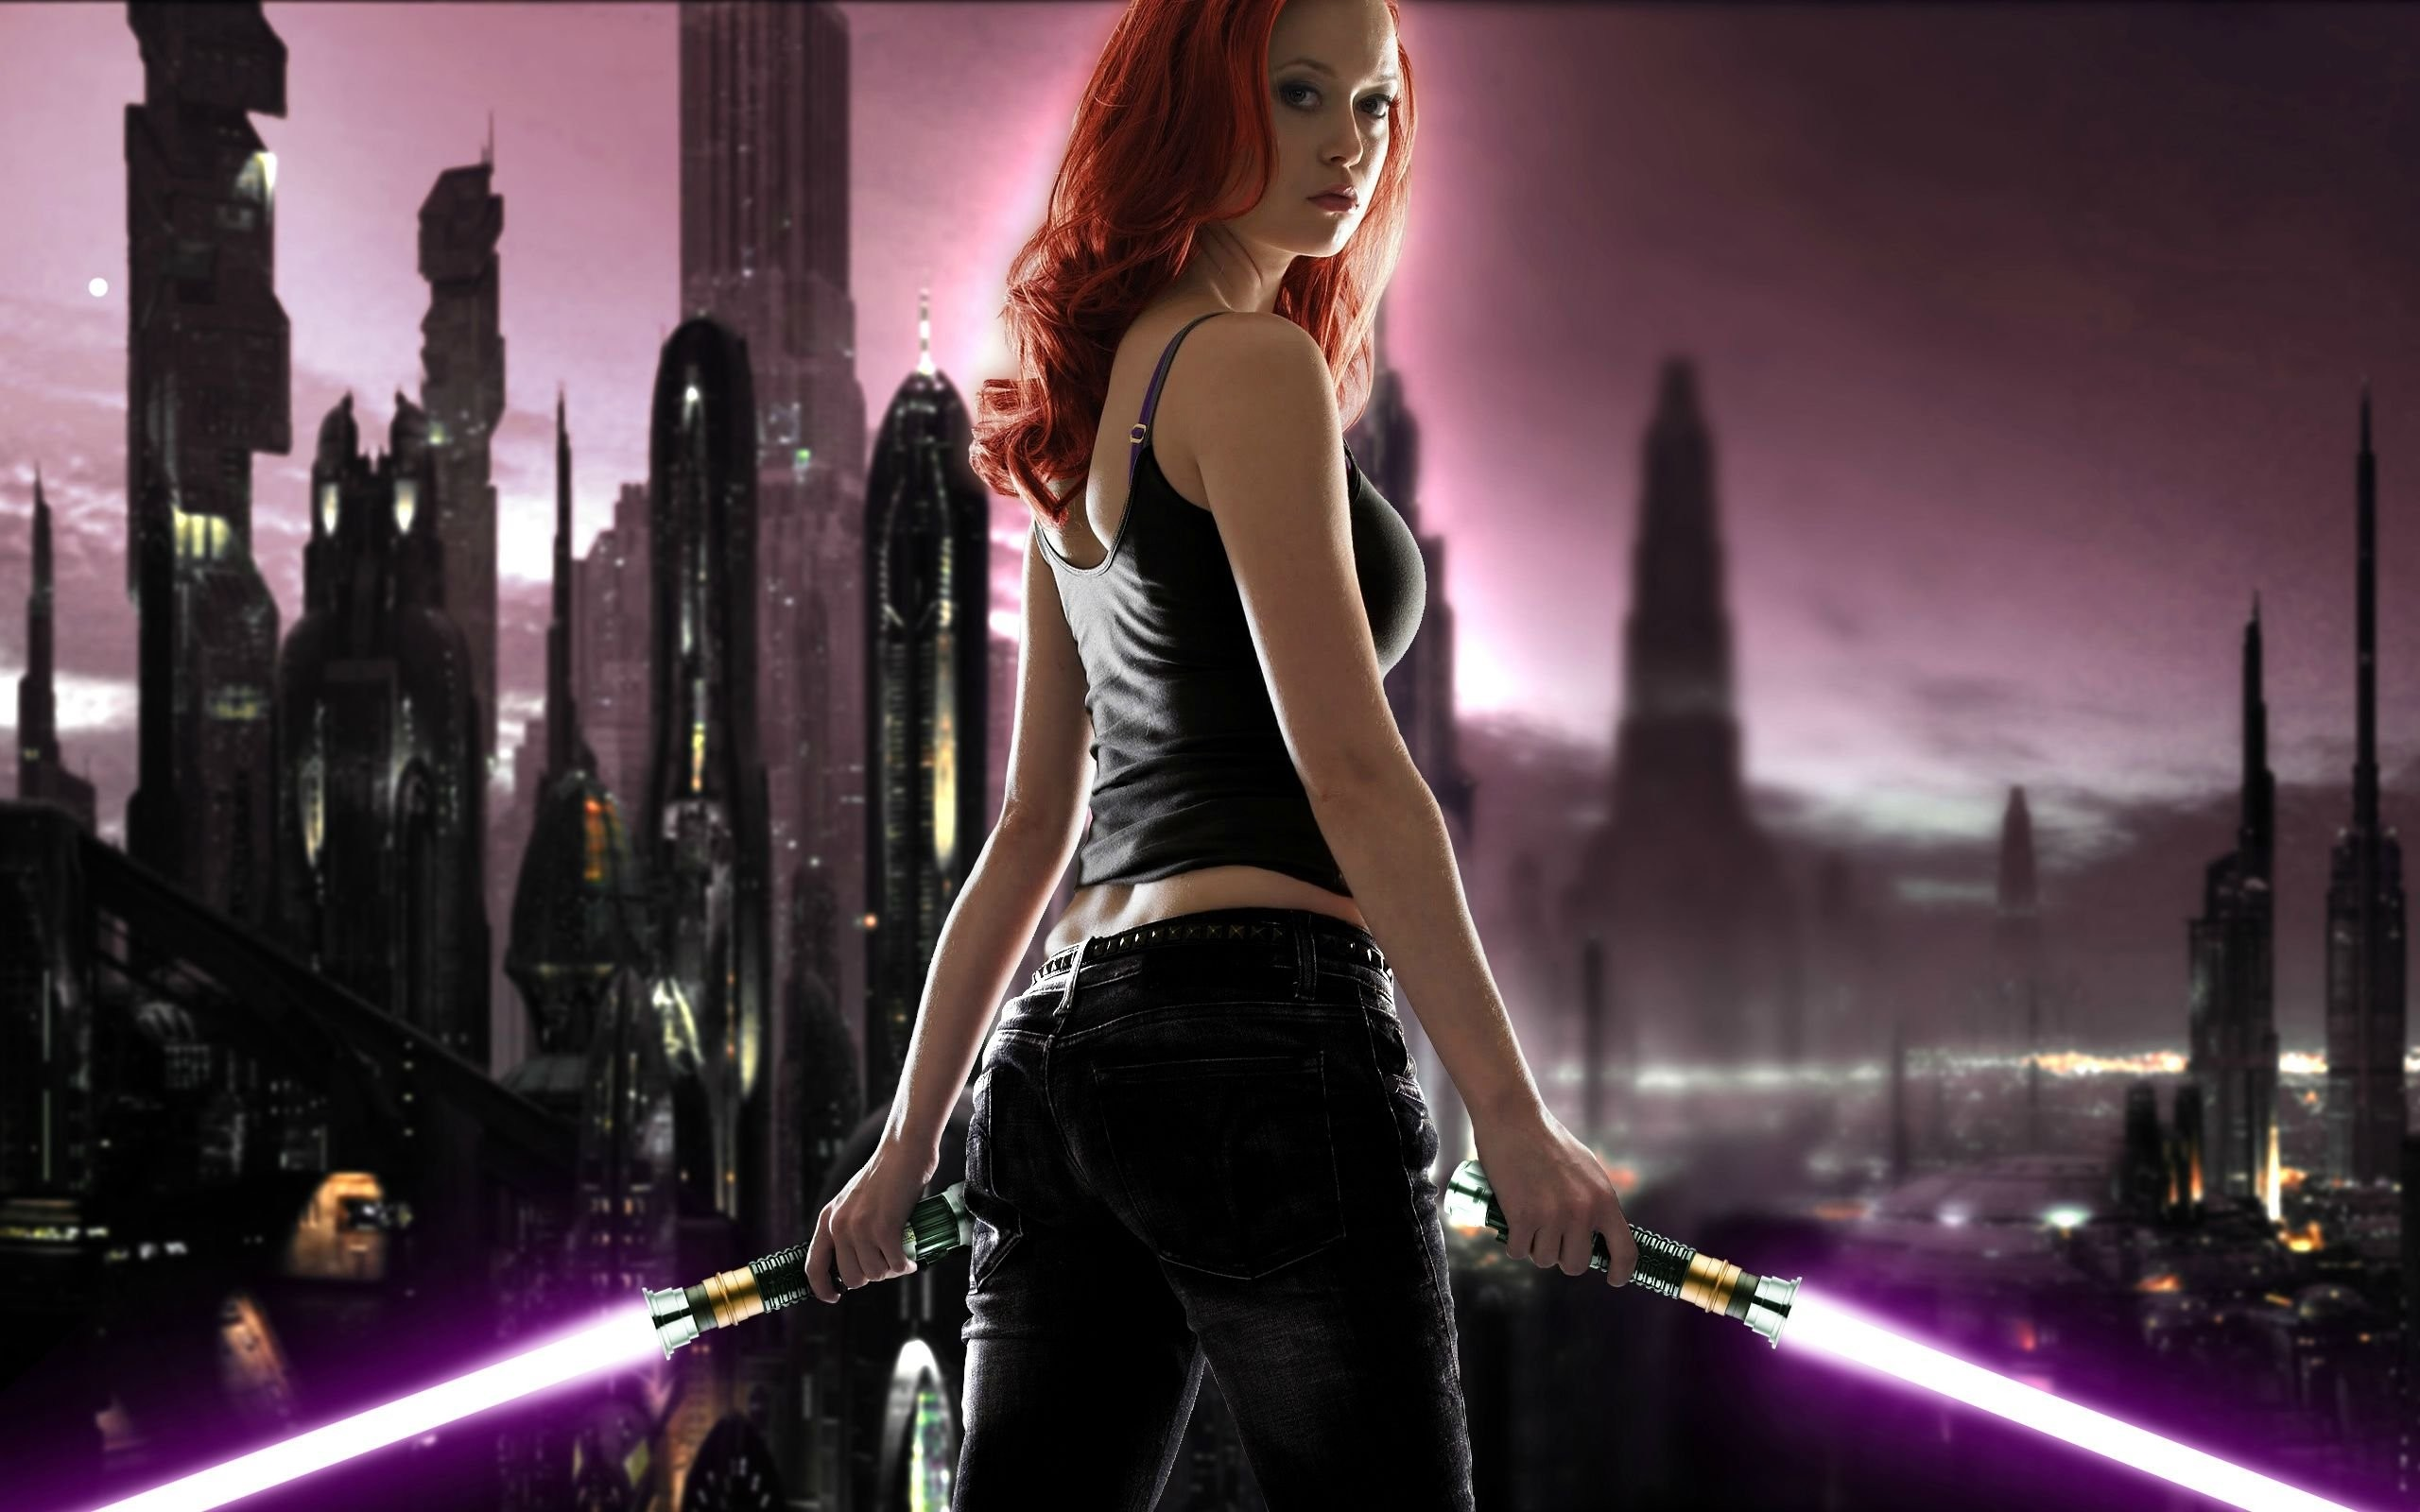 Dual Monitor Star Wars Wallpaper HD Resolution